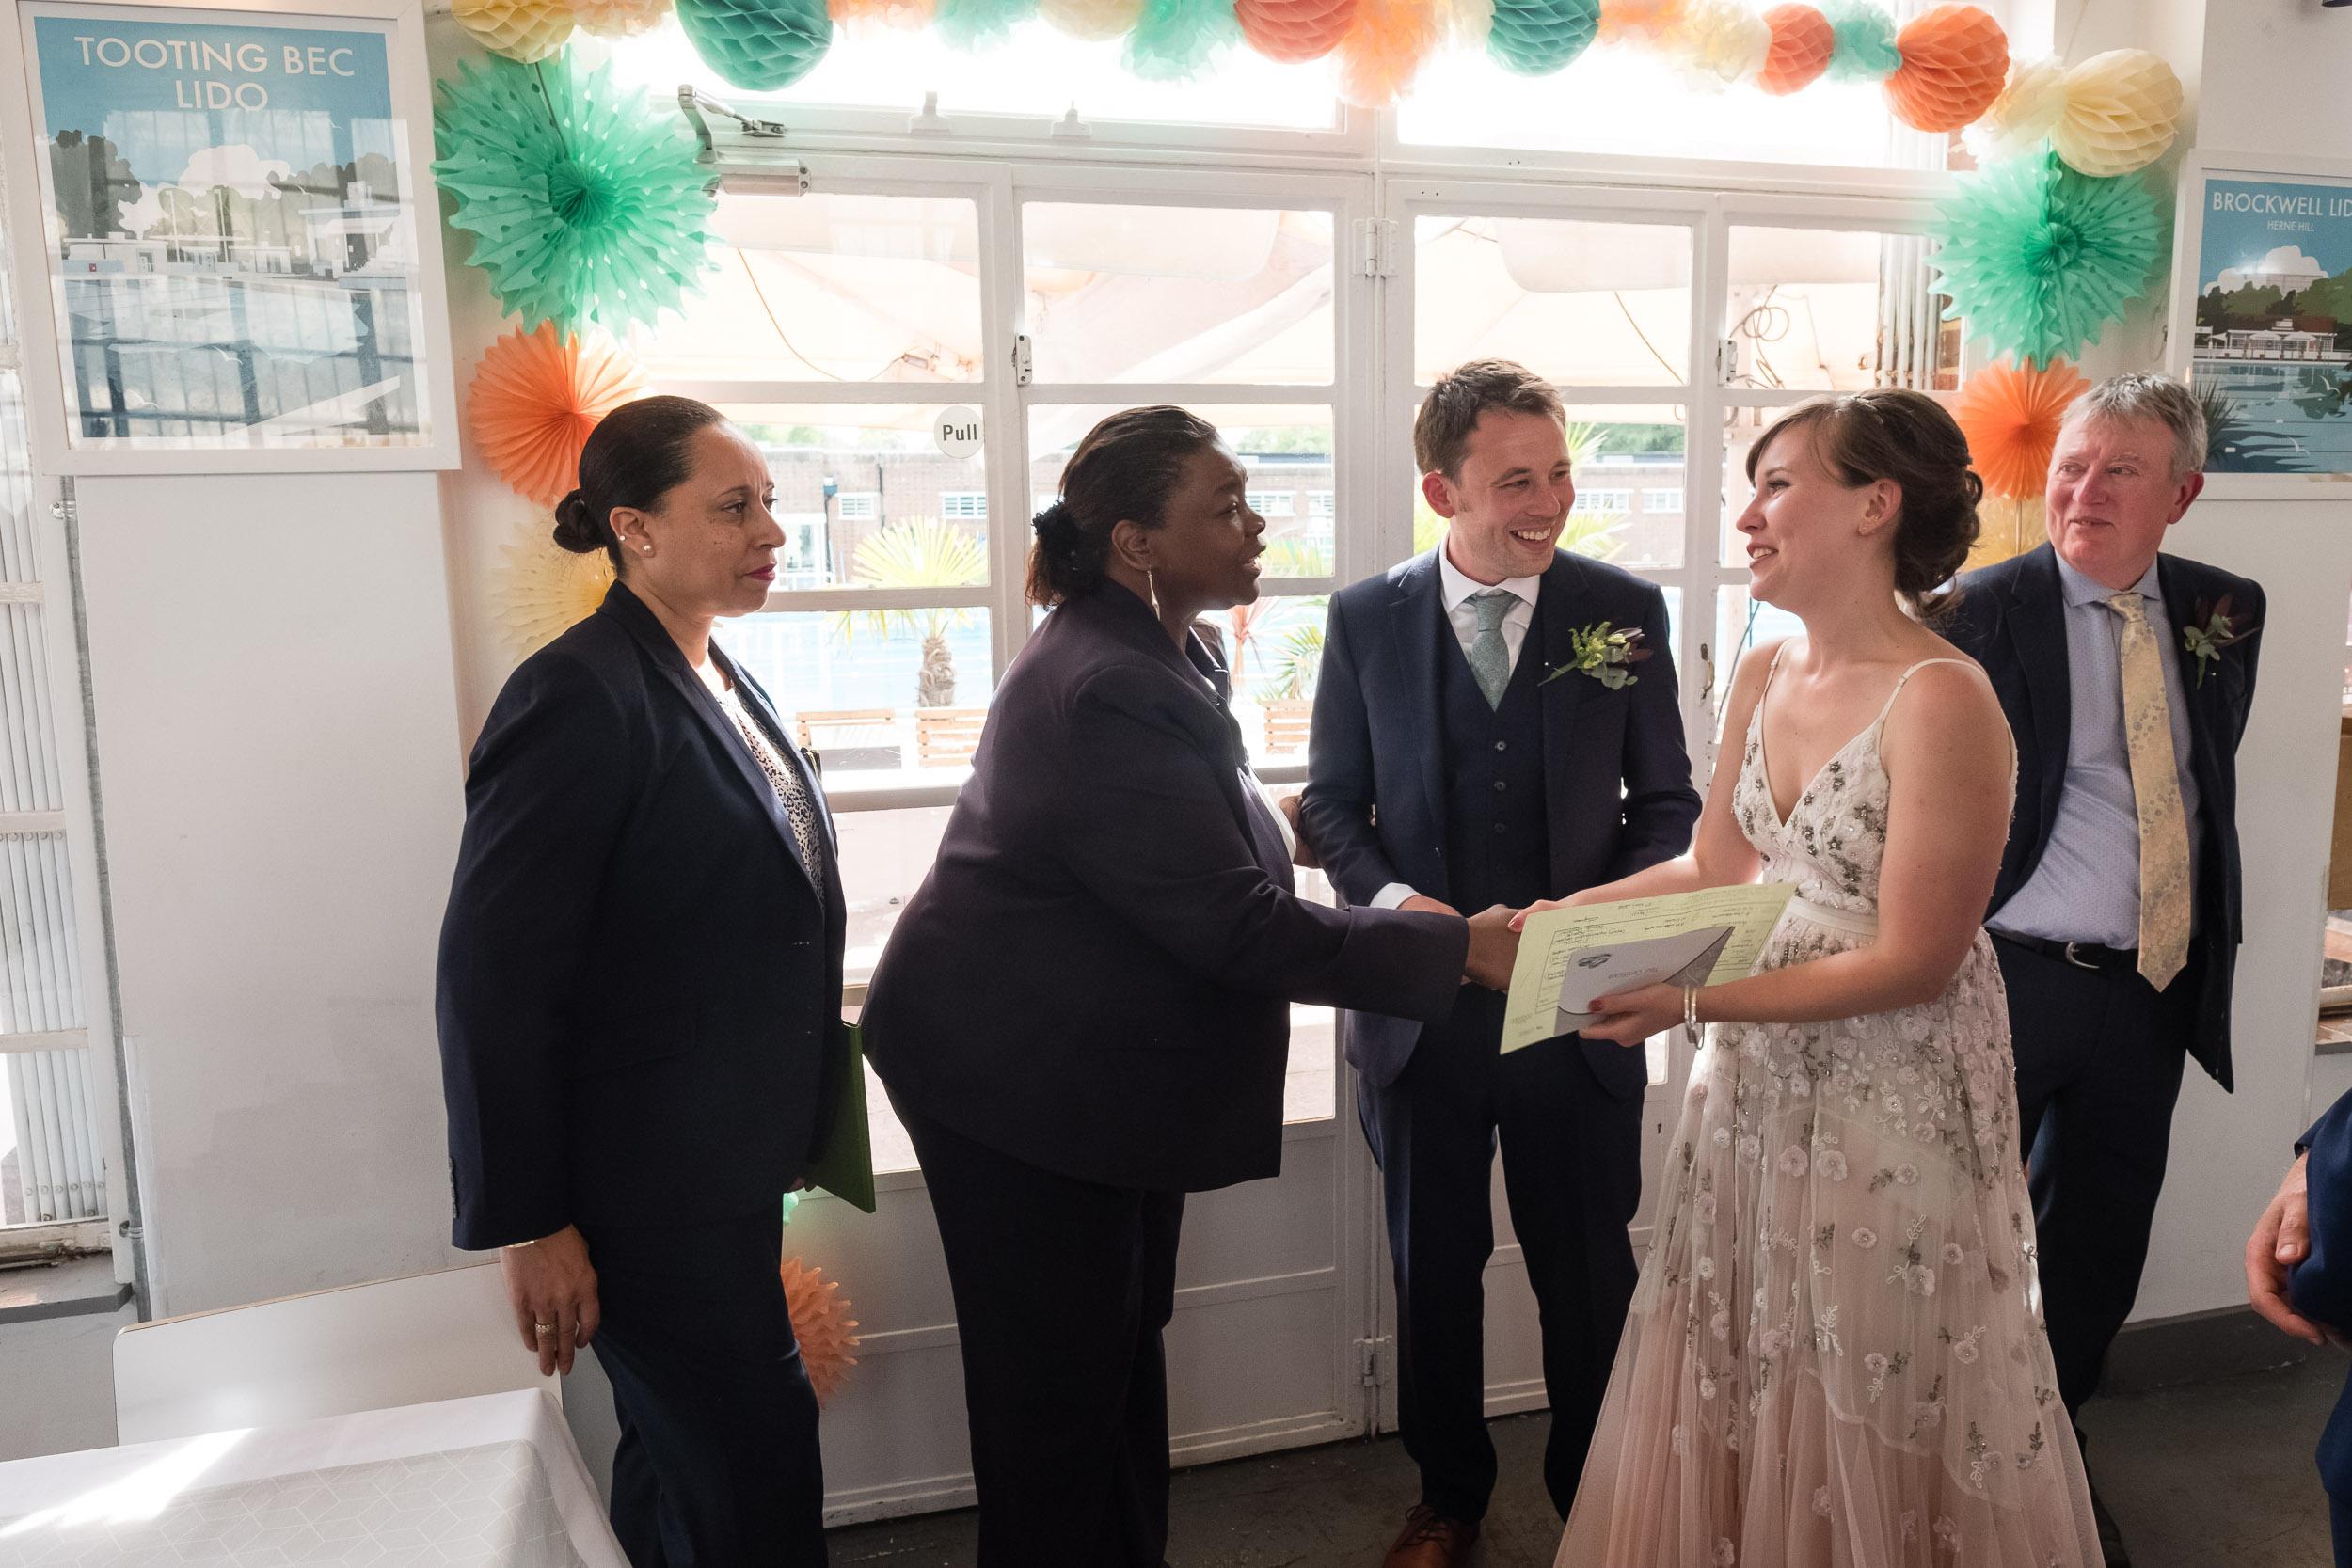 brockwell-lido-brixton-herne-hill-wedding-201.jpg